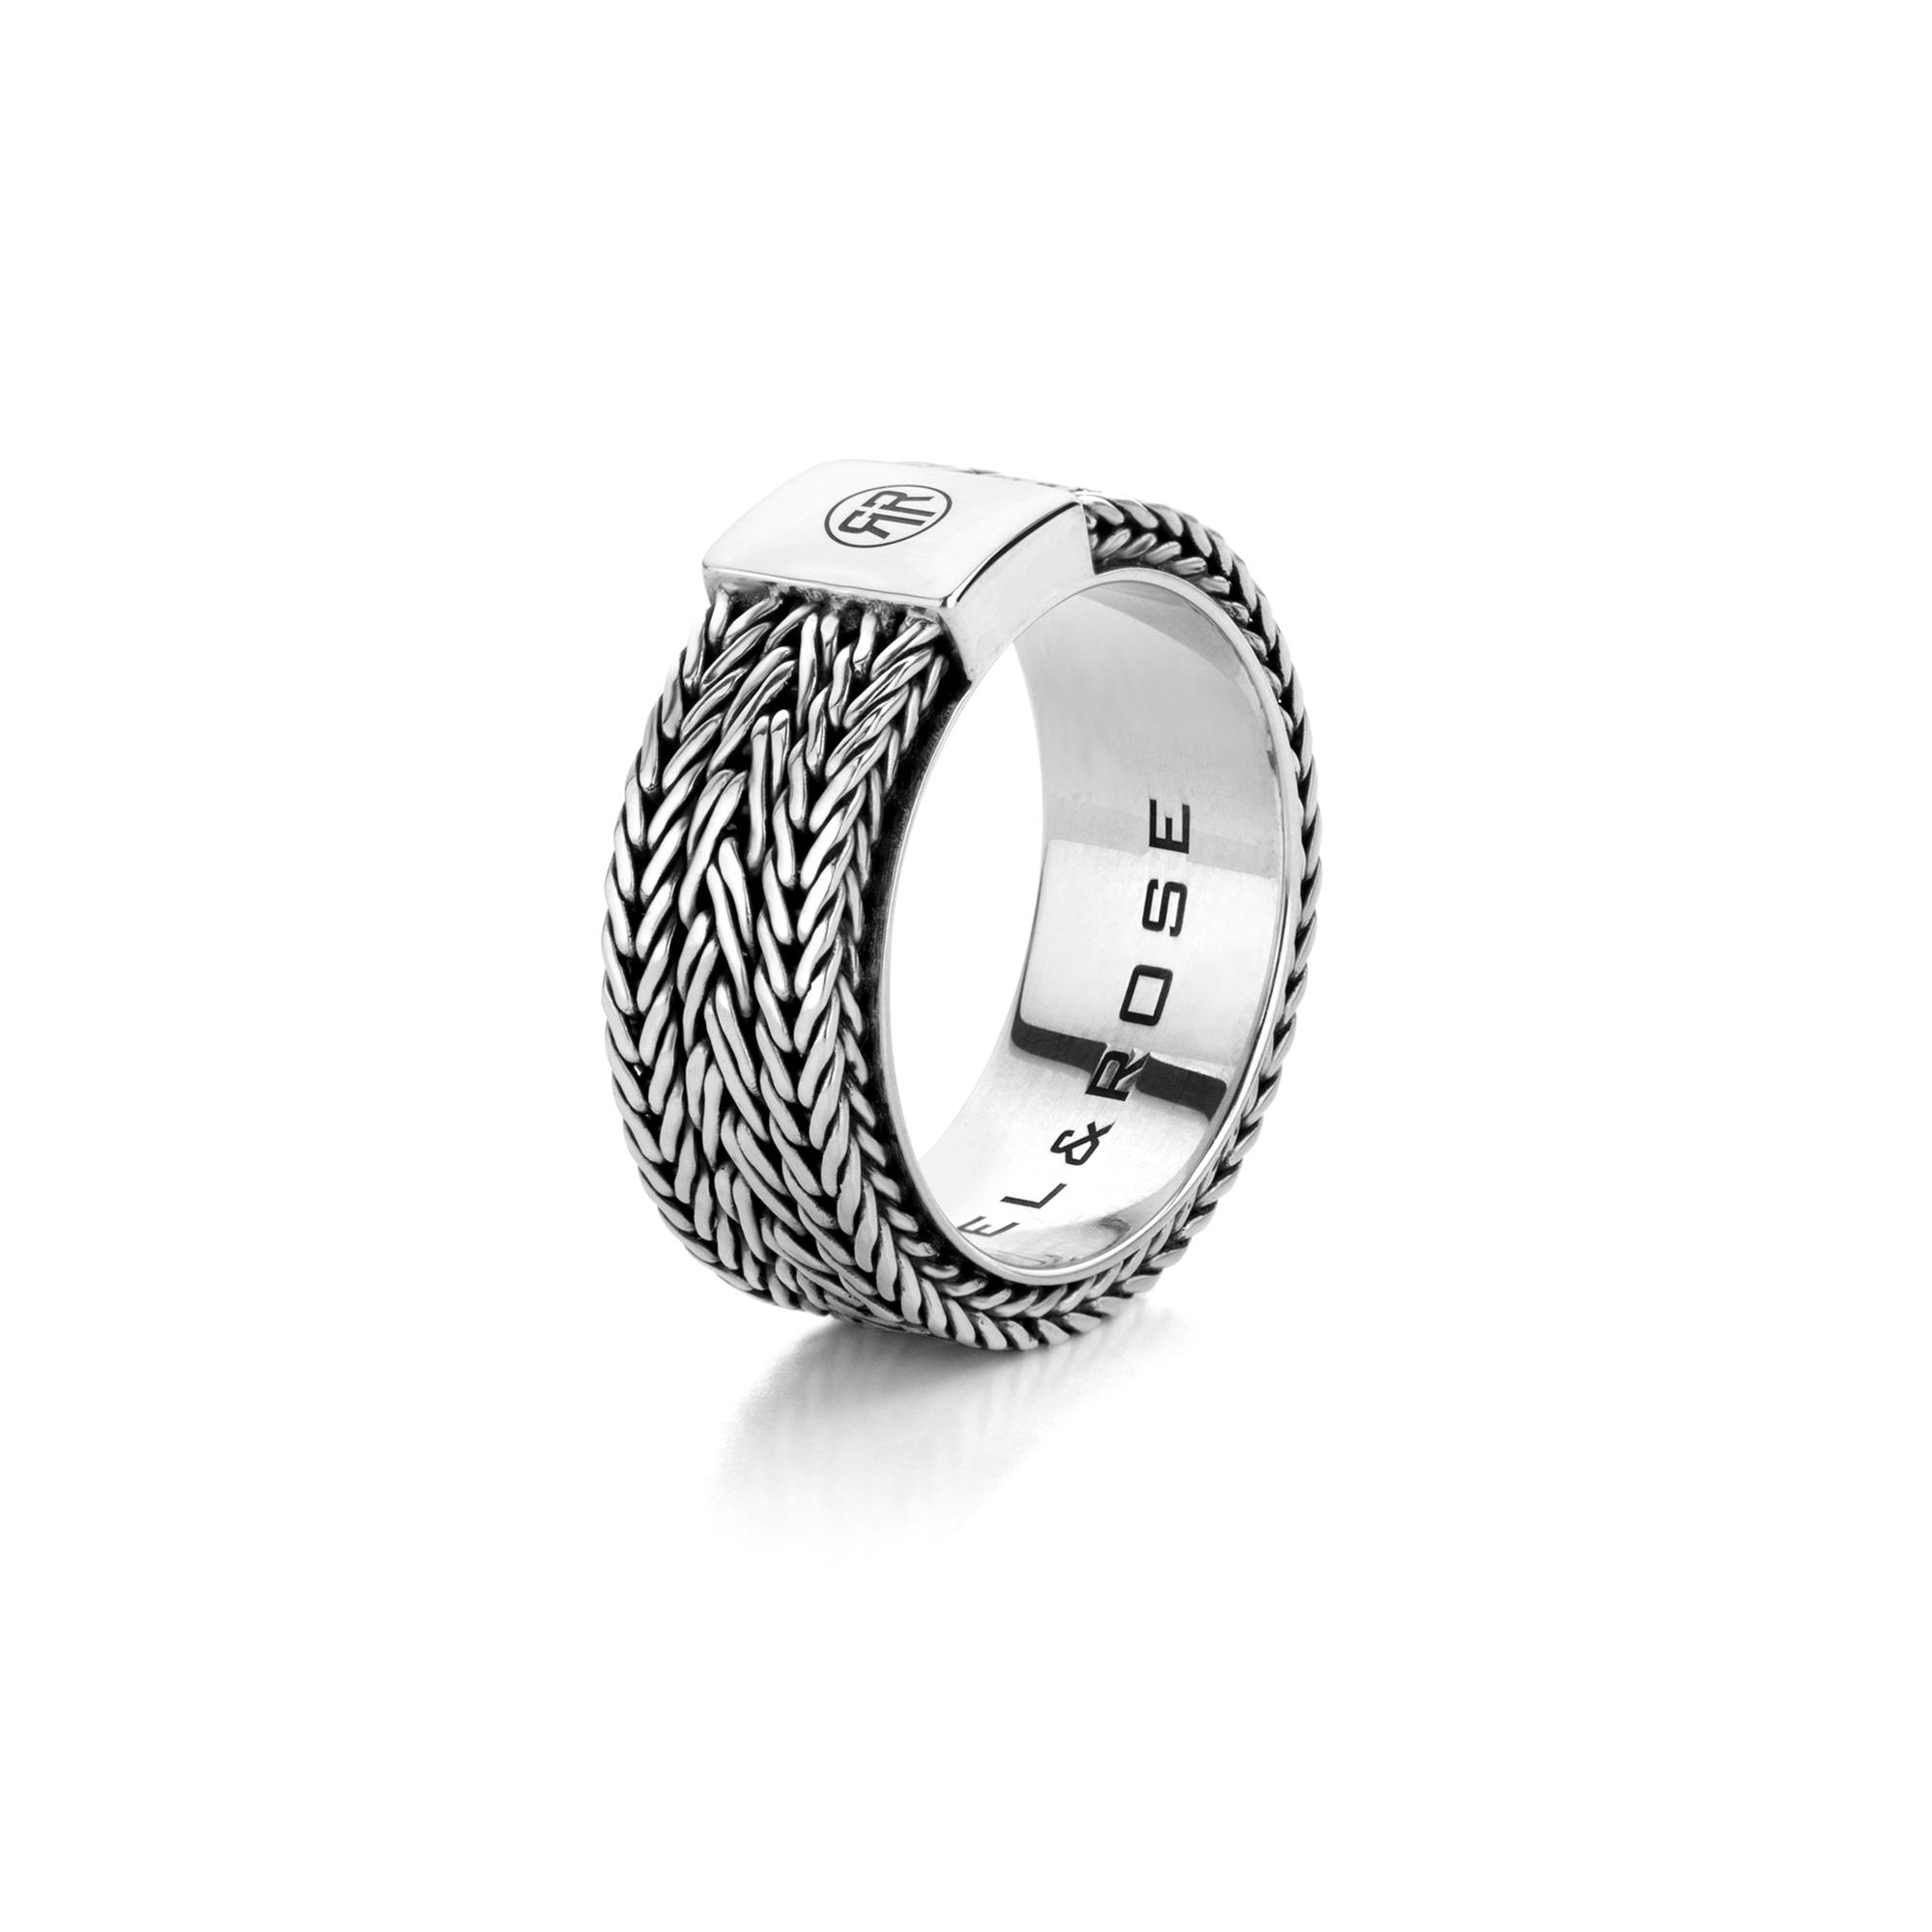 Rebel and Rose RR RG020 S Ring Triton zilver Maat 66